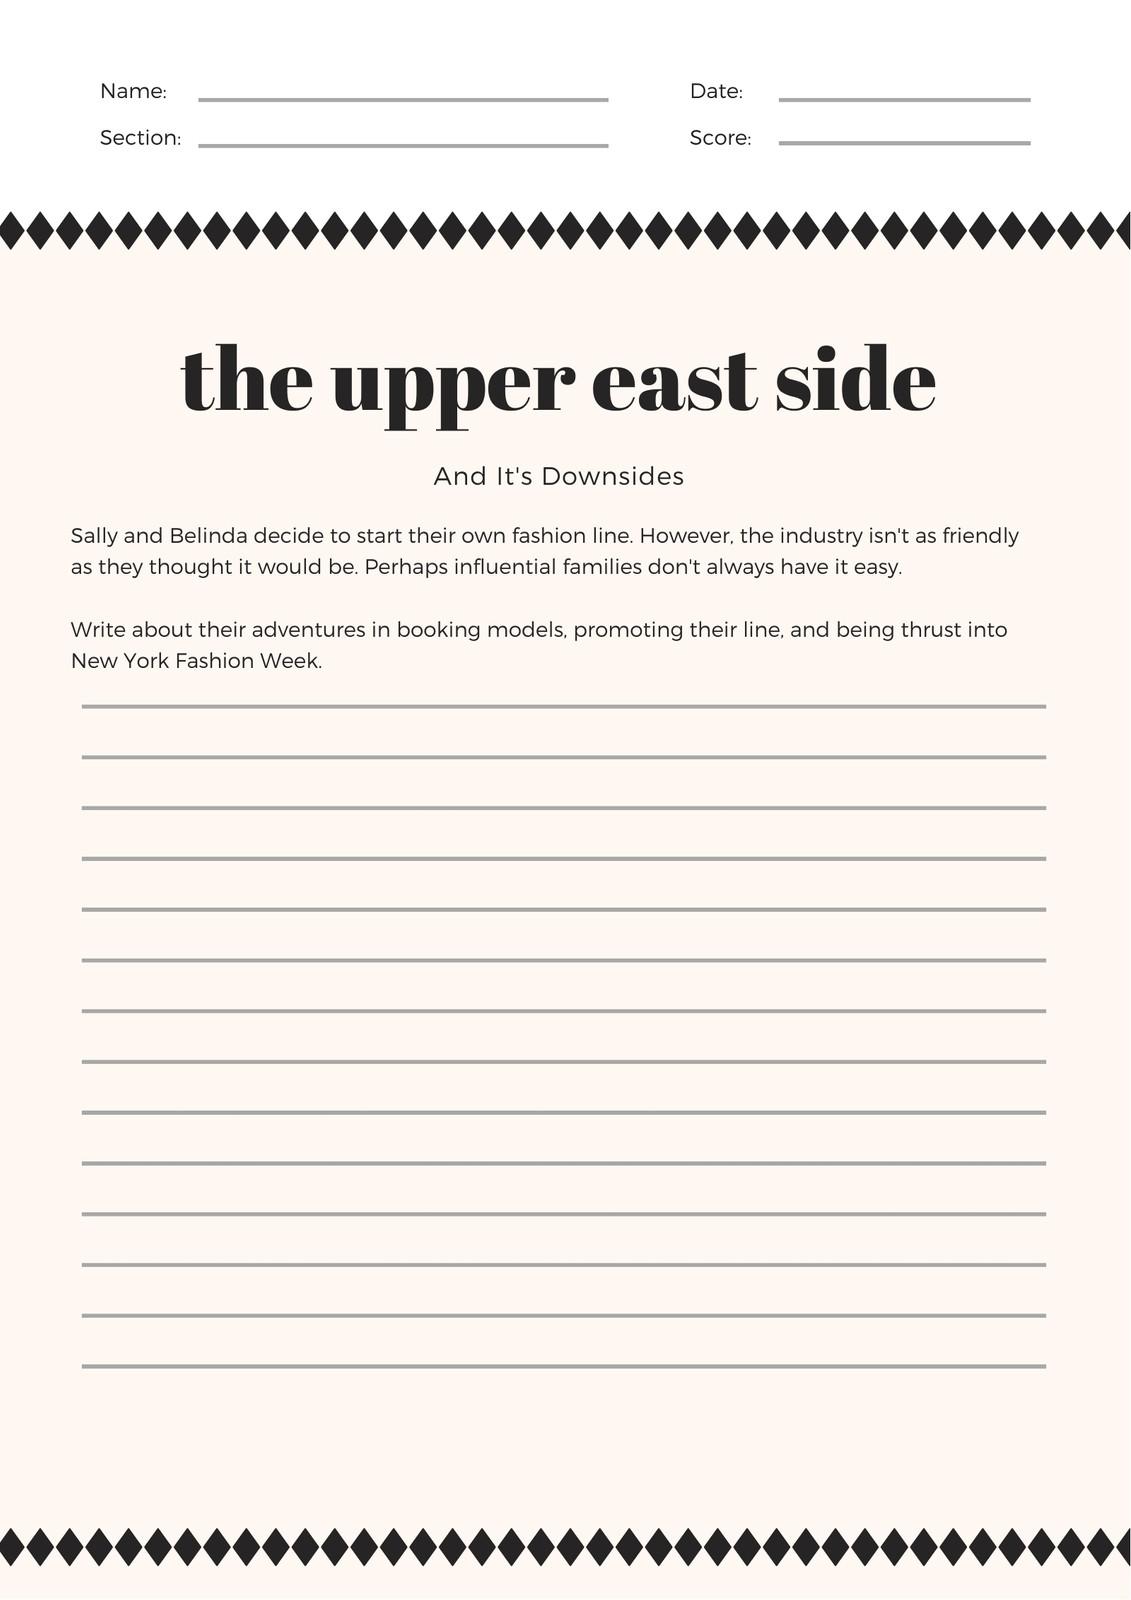 Cream Simple Diamond Patterned Writing Prompt Worksheet